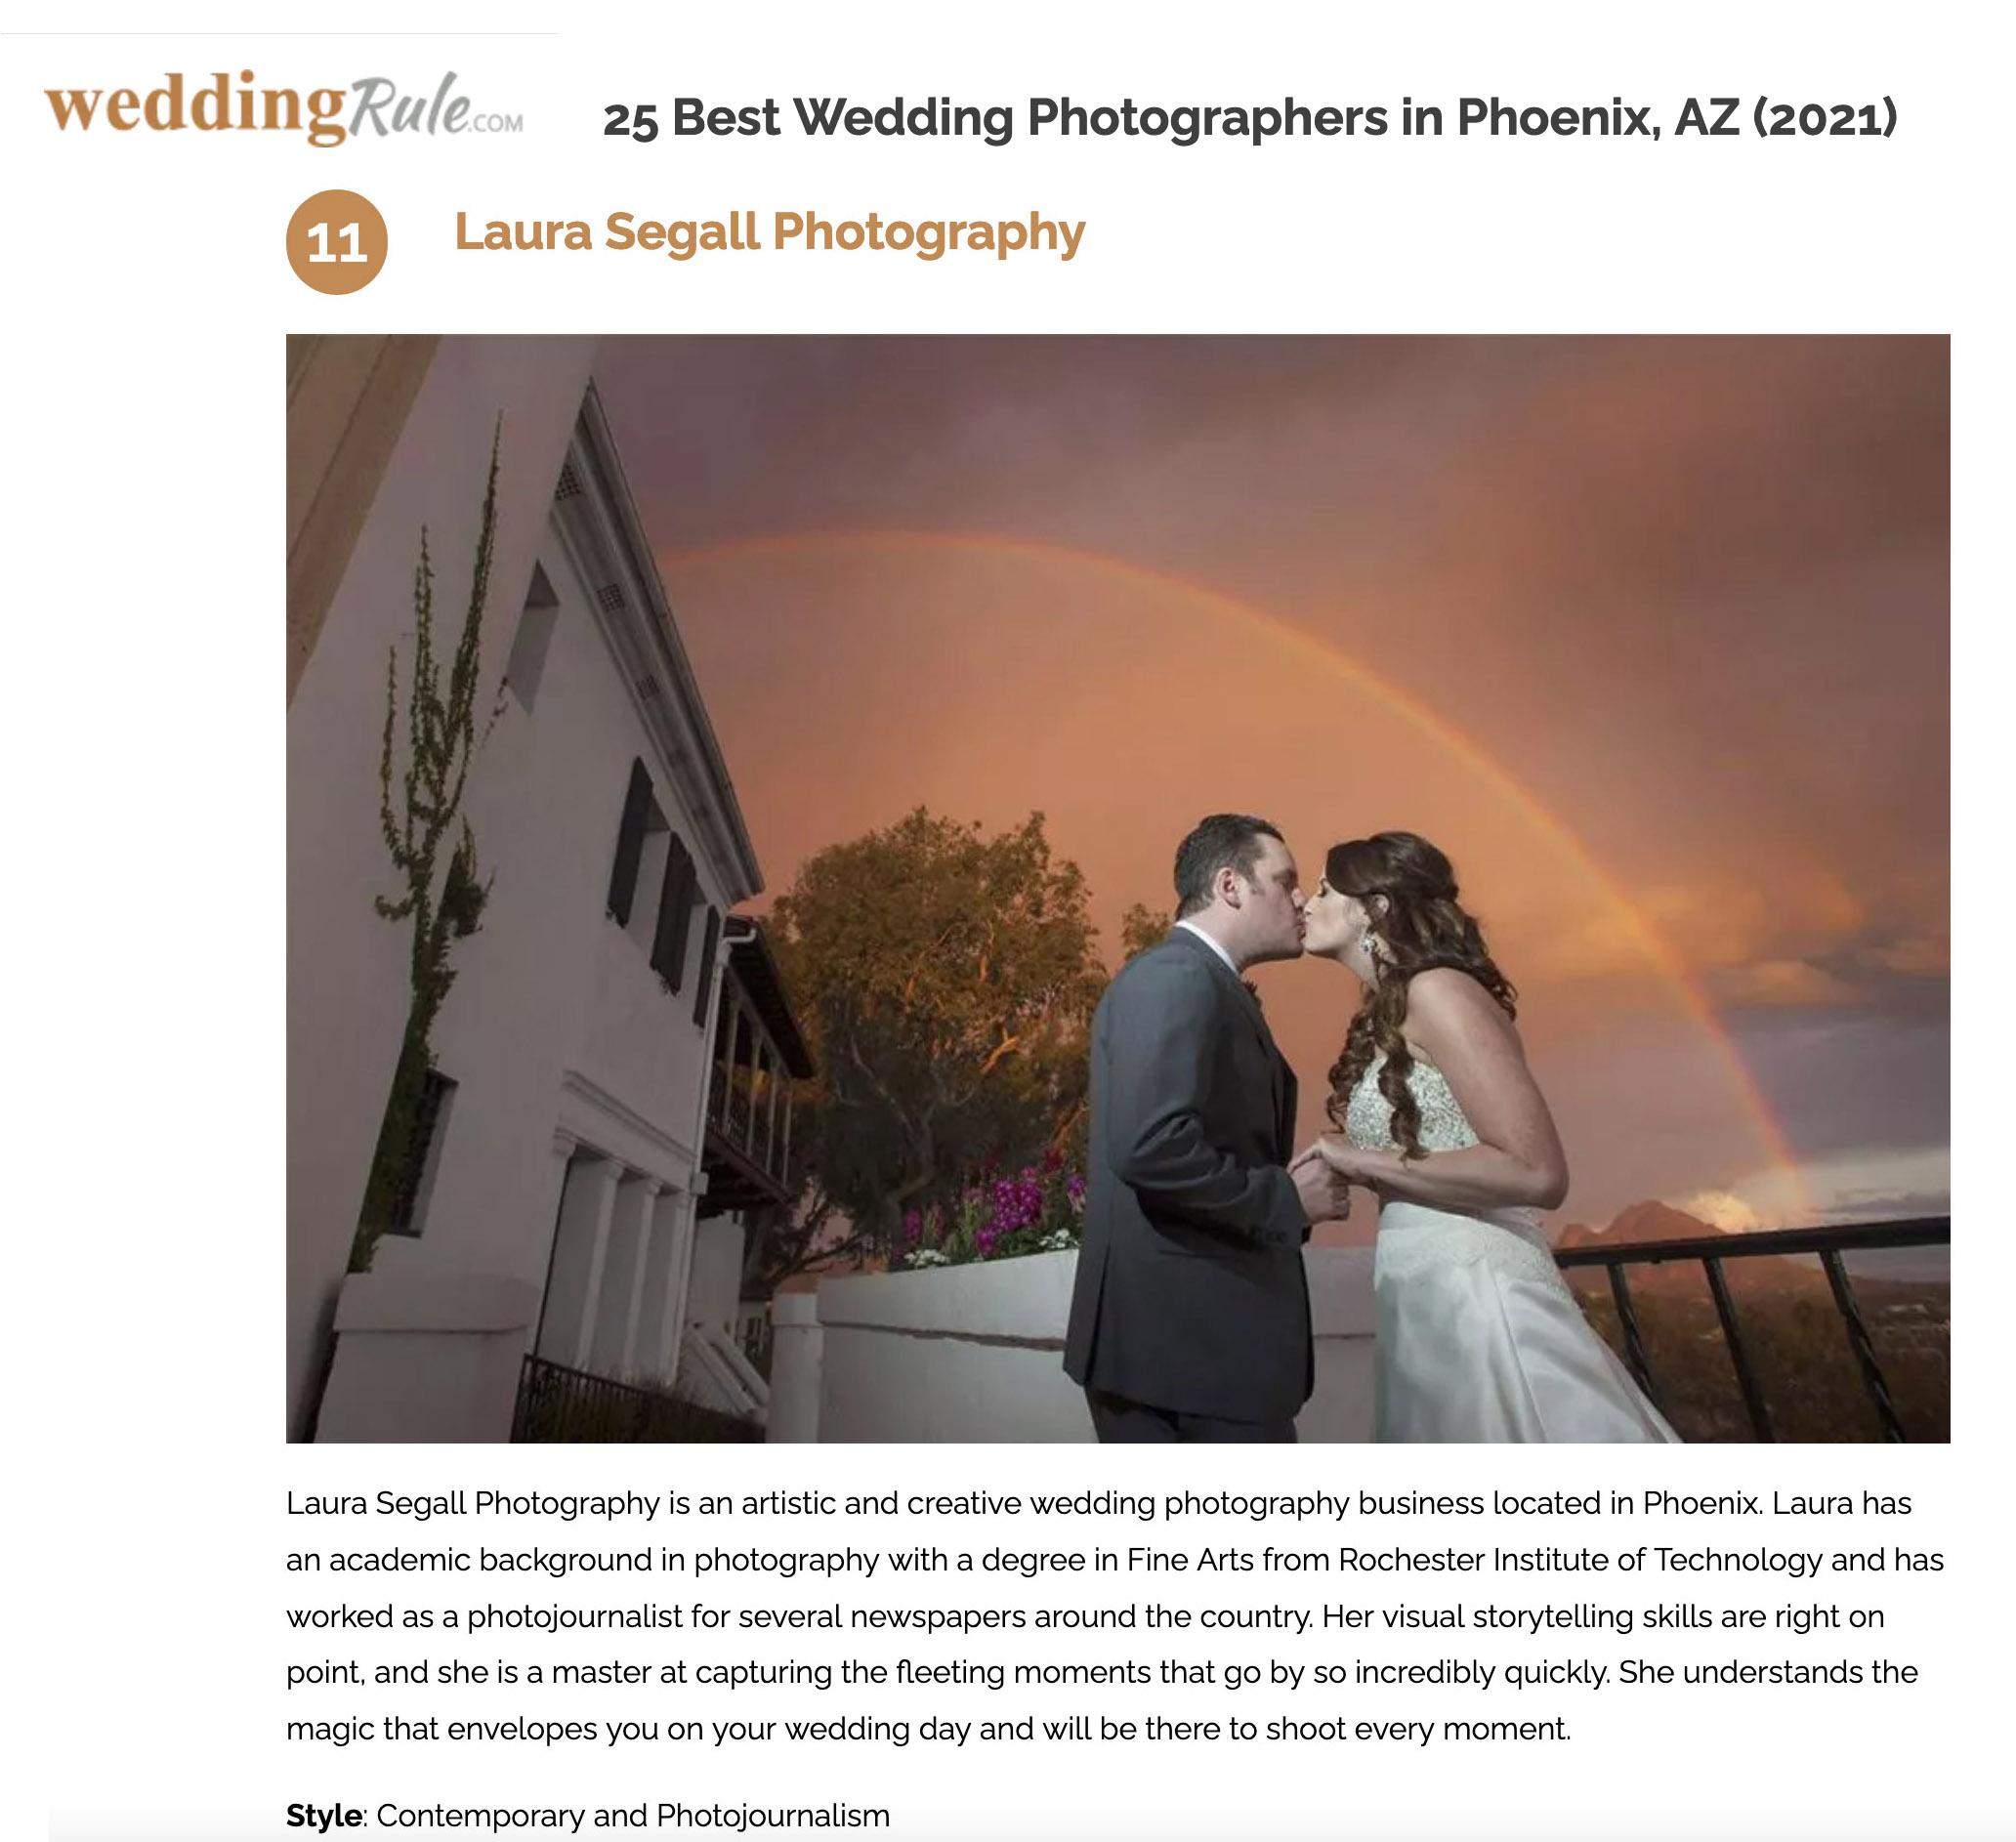 Top 25 wedding photographers